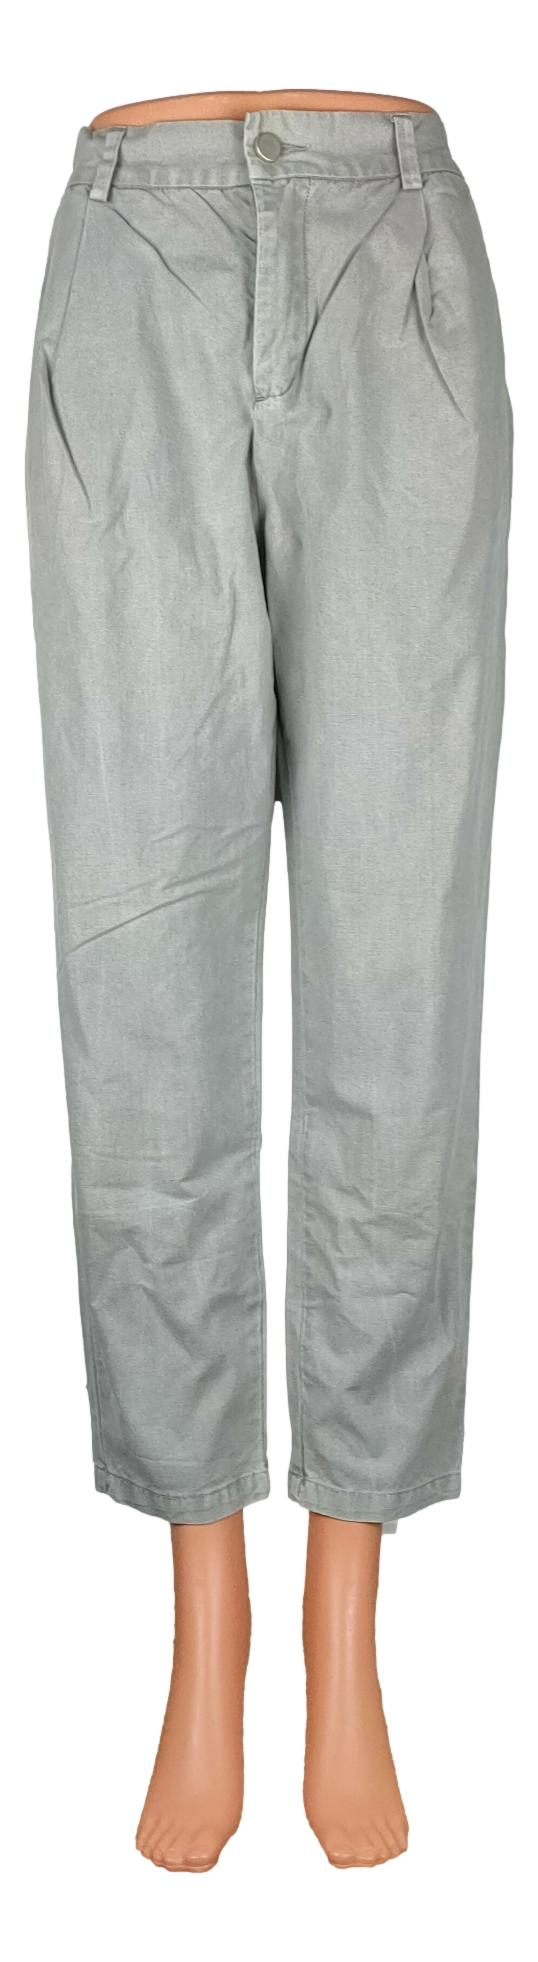 Pantalon Asos - Taille 34